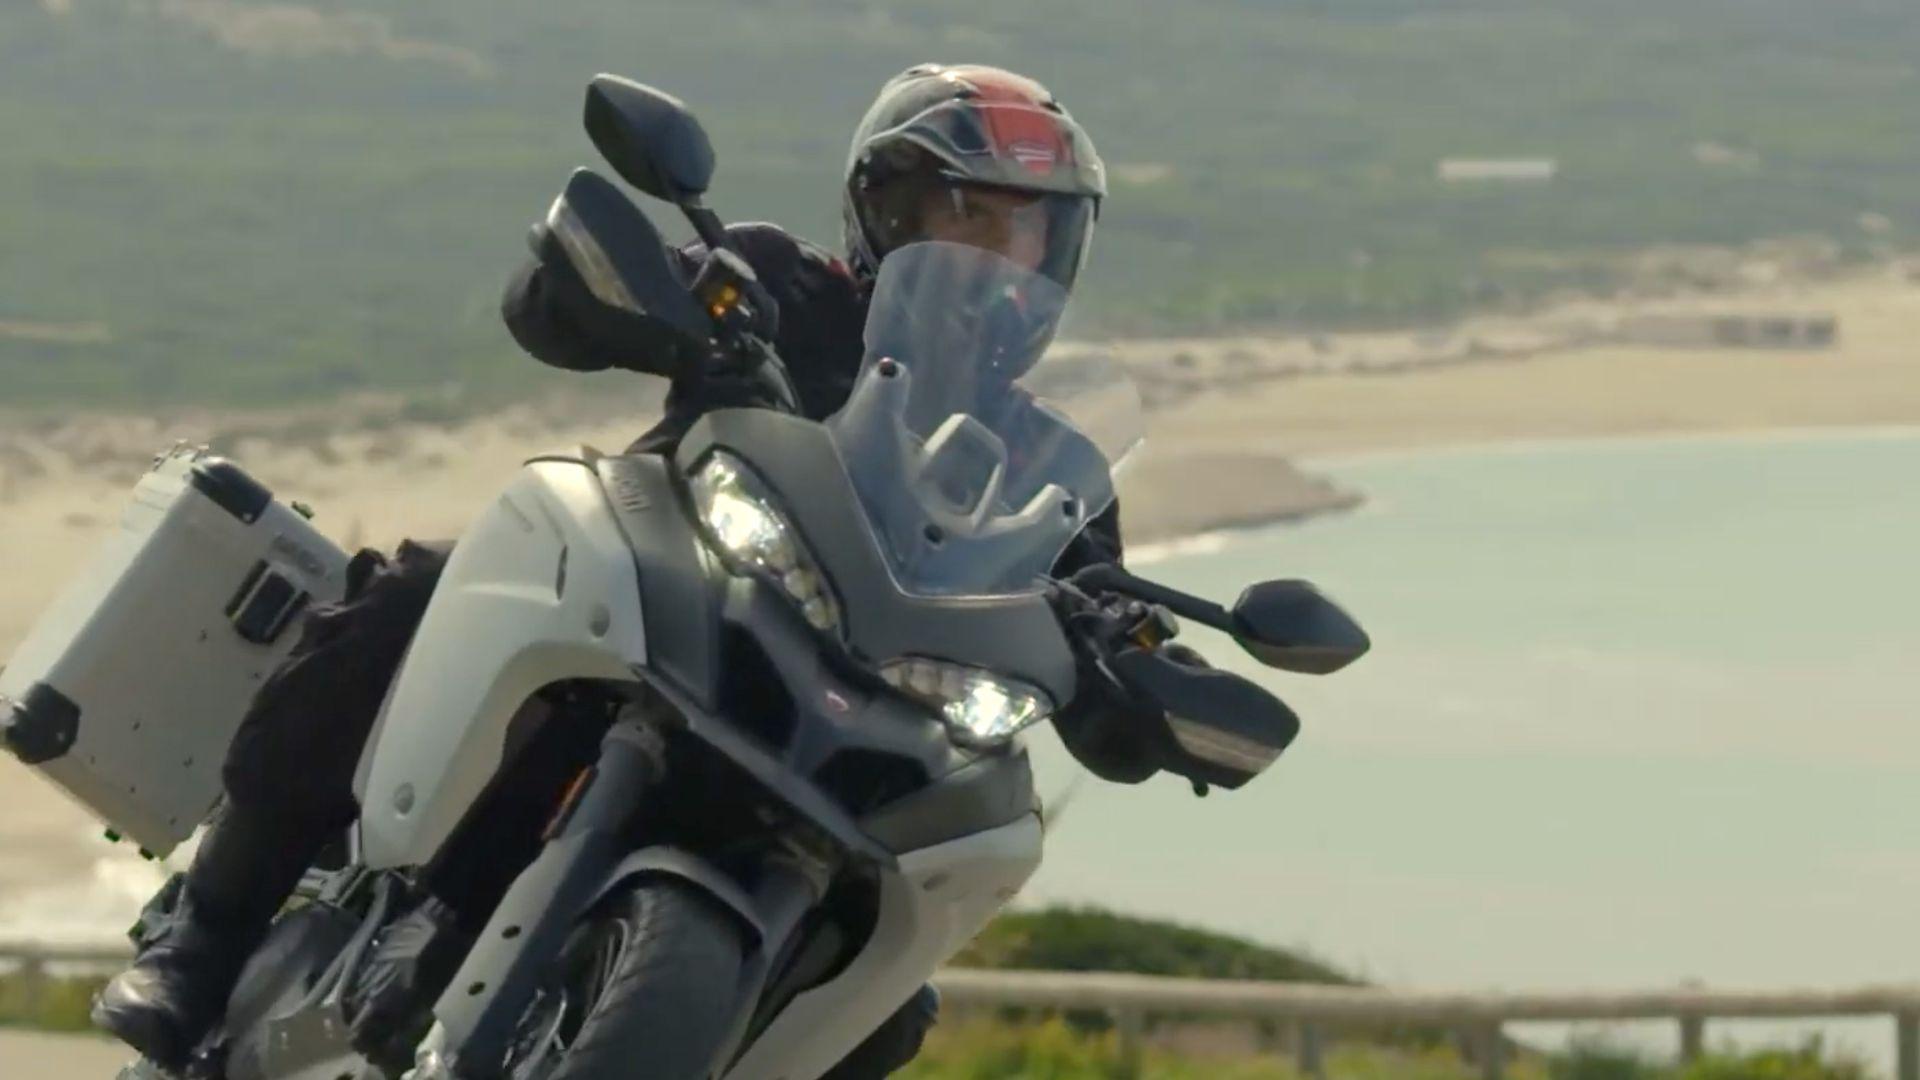 Ducati Multistrada 1200 Enduro | K+